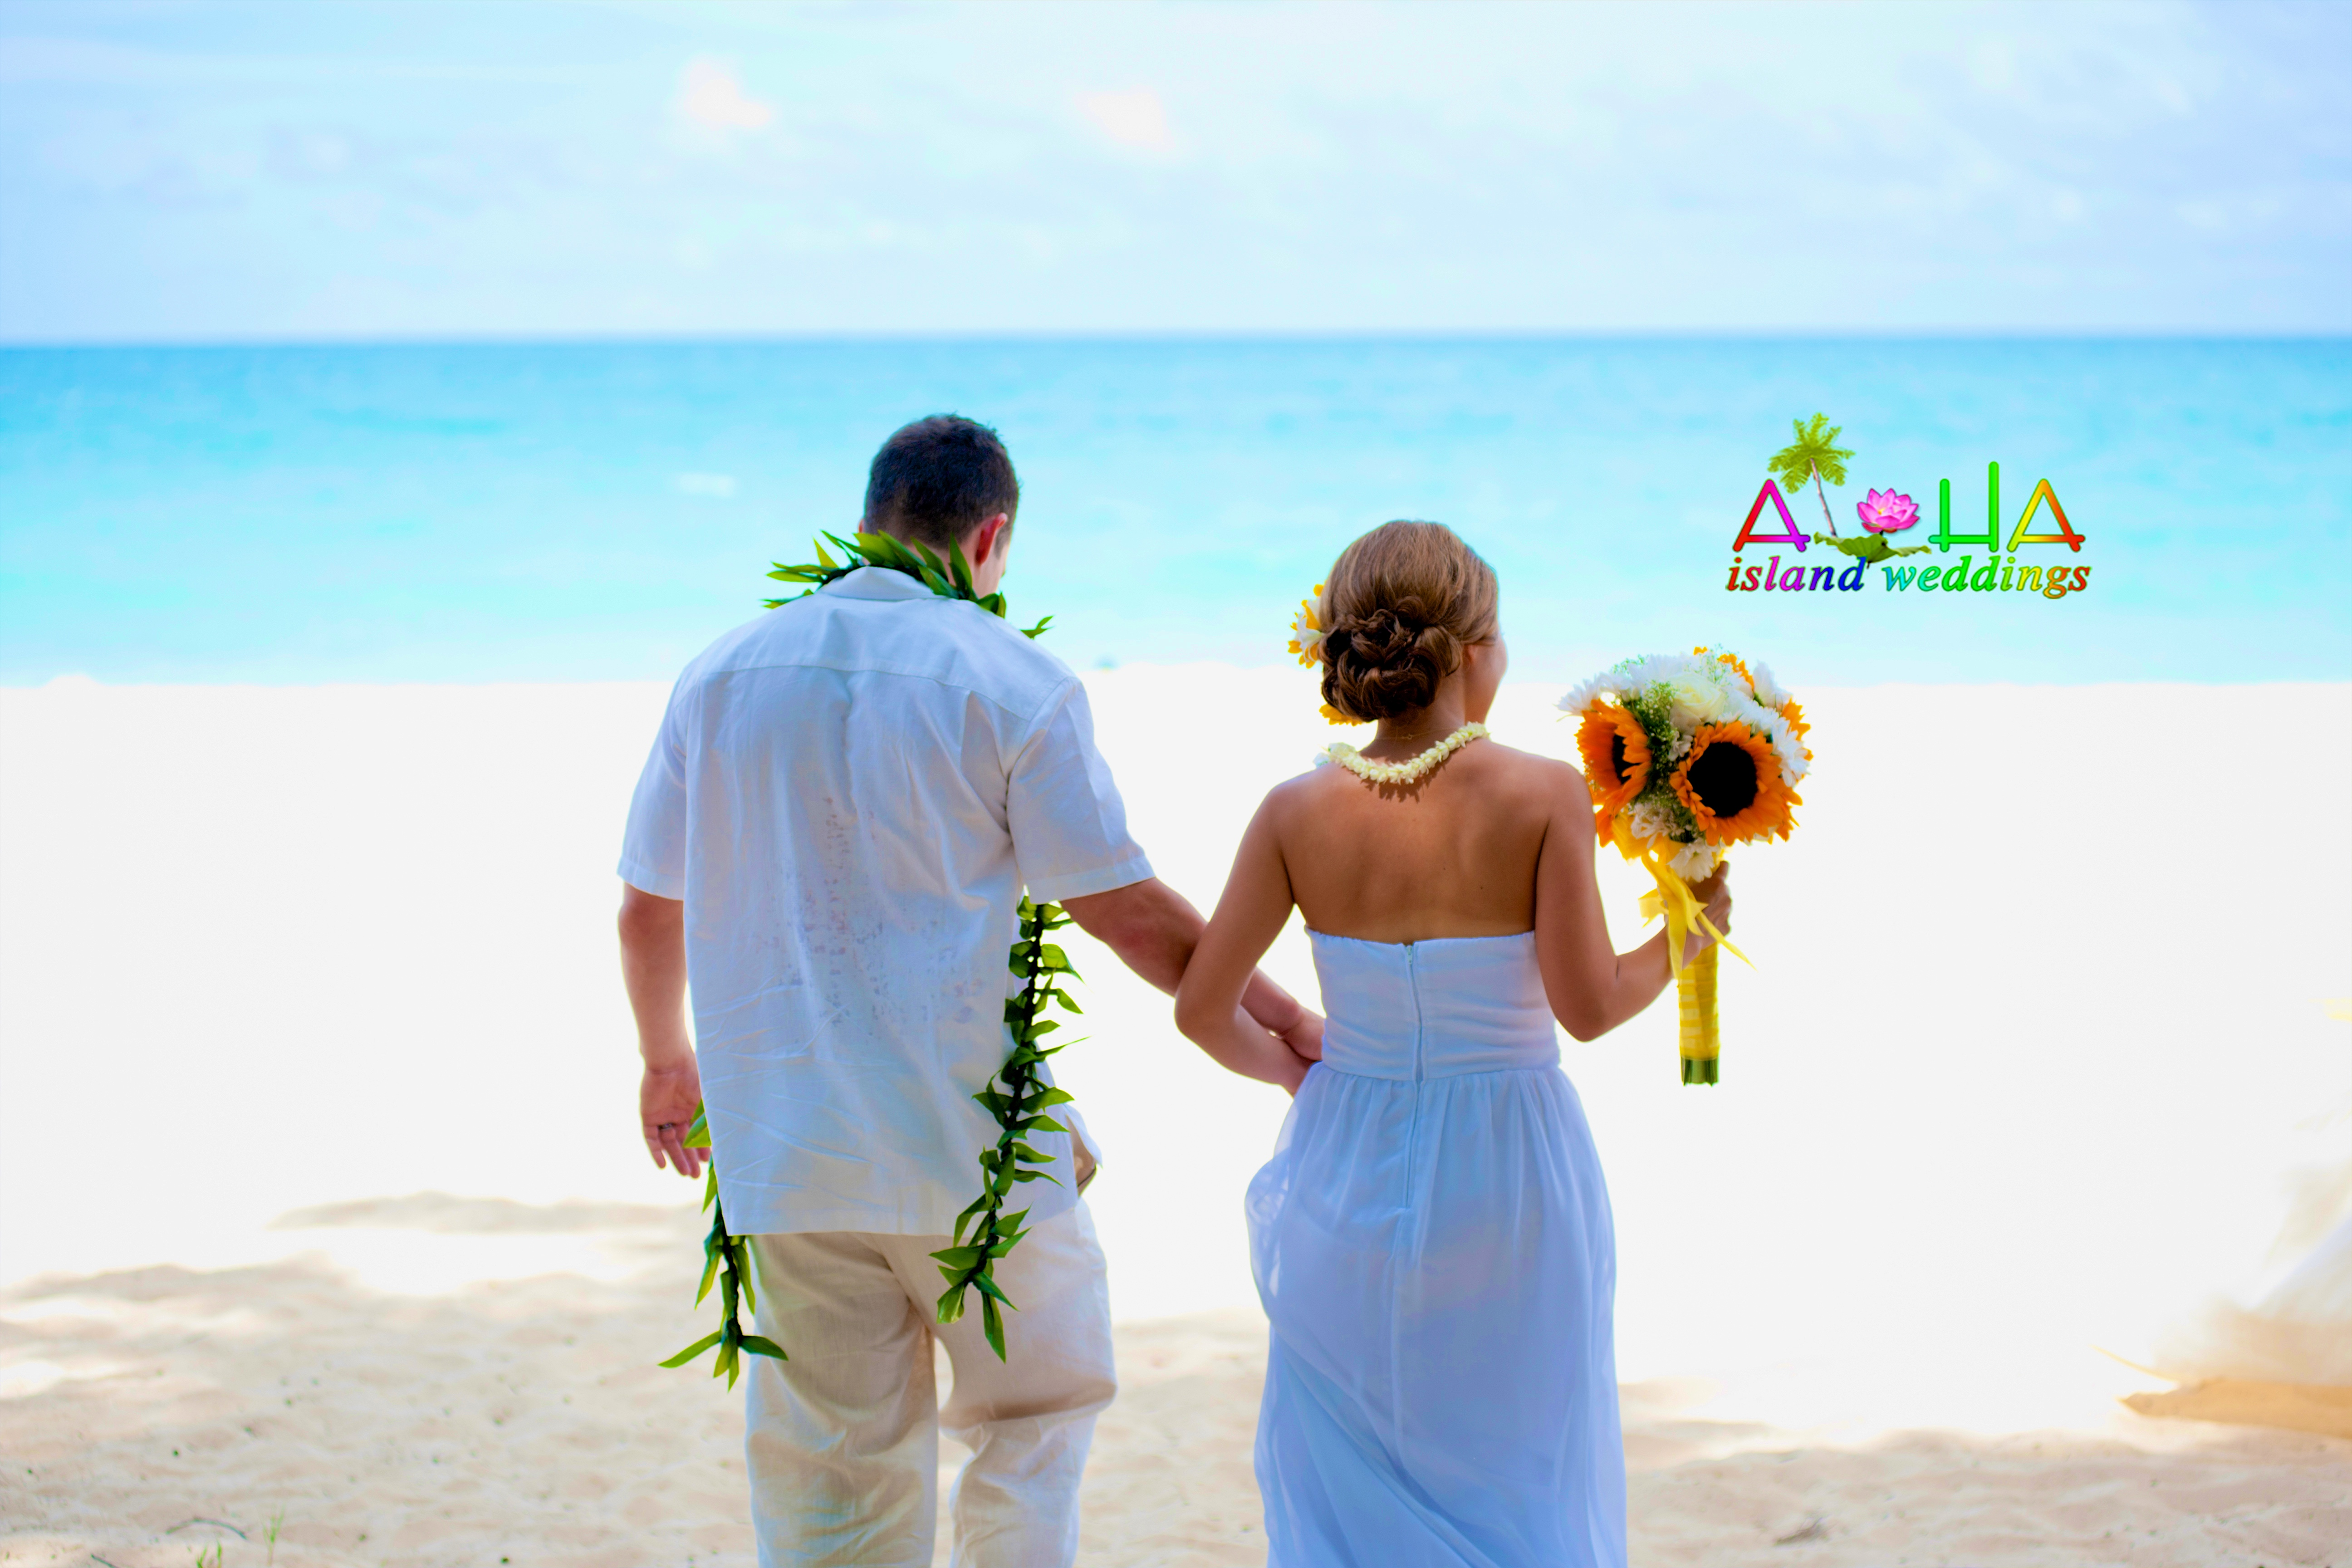 Wedding In Hawaii - by alohaislandweddings.com-1